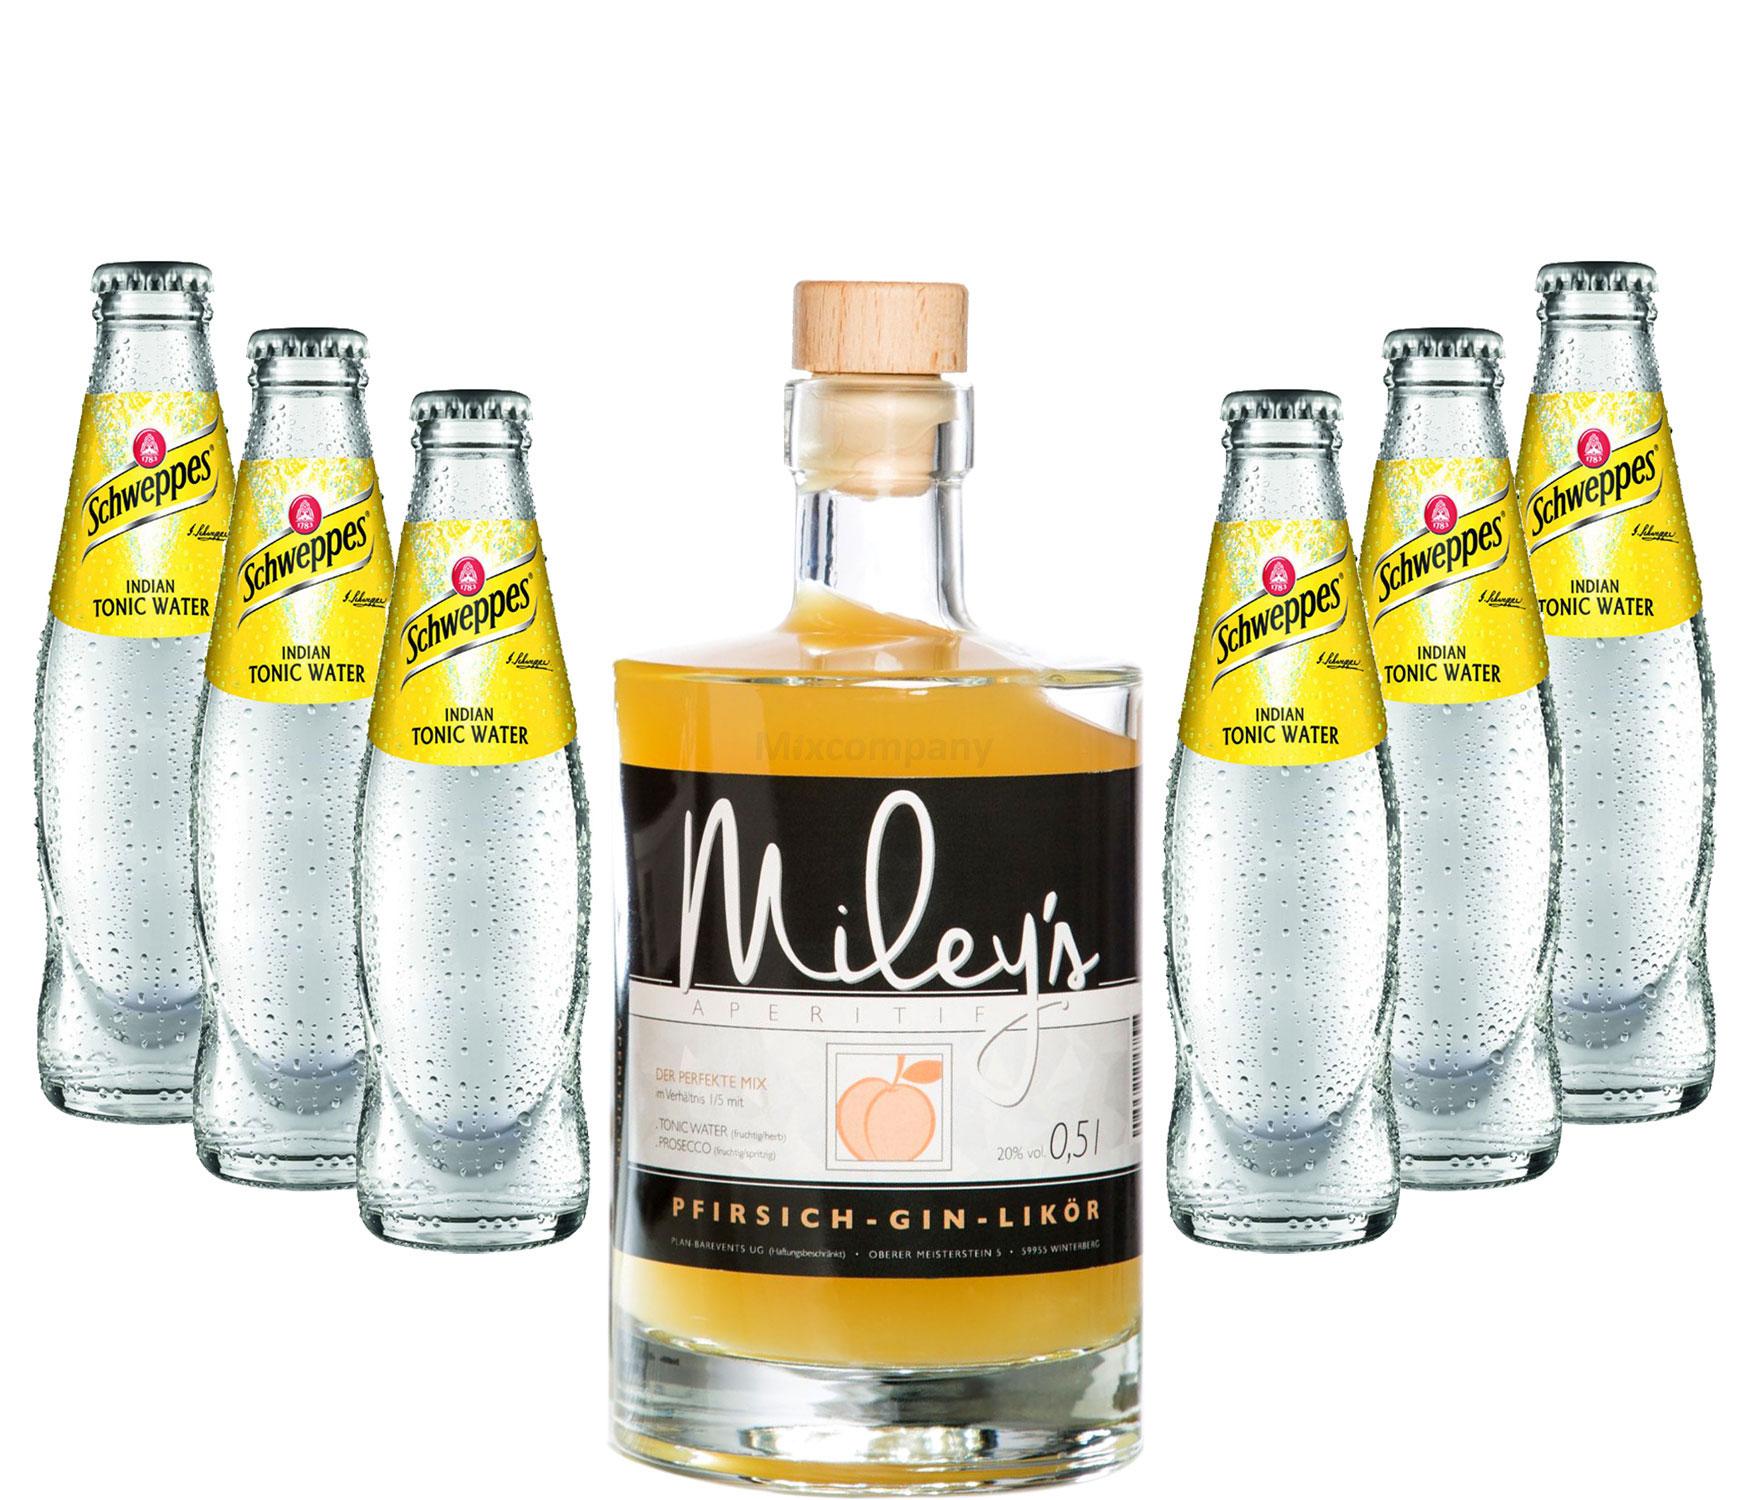 Mileys Pfirsich Gin Likör 0,5l (20% Vol) + 6x Schweppes Tonic Water 200ml inkl. Pfand MEHRWEG -[Enthält Sulfite]